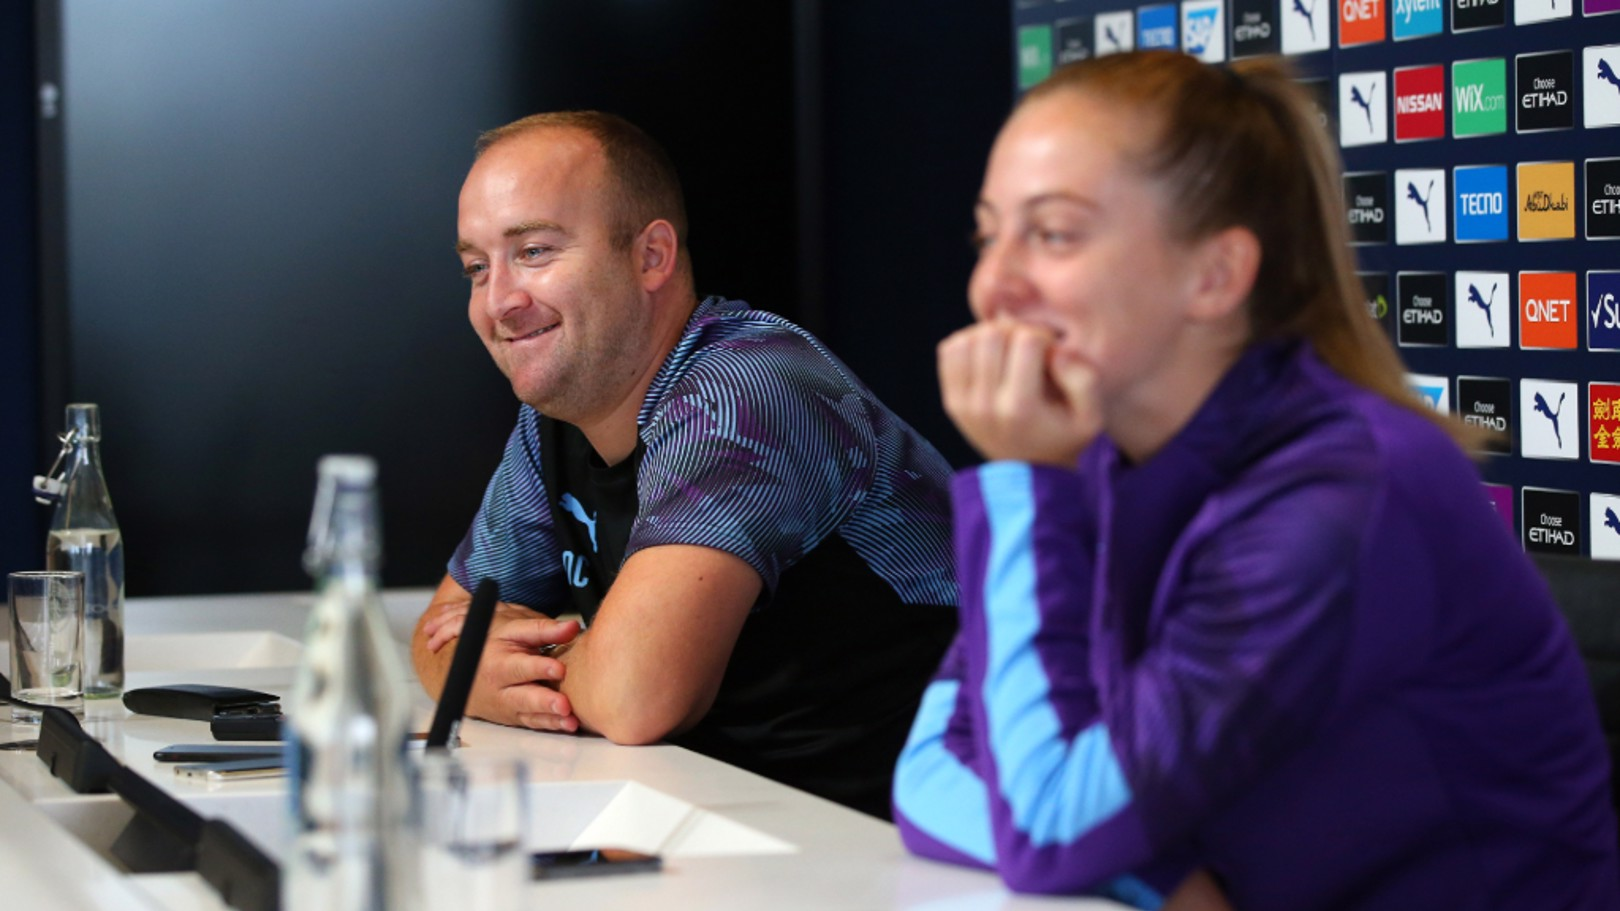 INFLUENTIAL: Nick Cushing hailed Keira Walsh's footballing intelligence